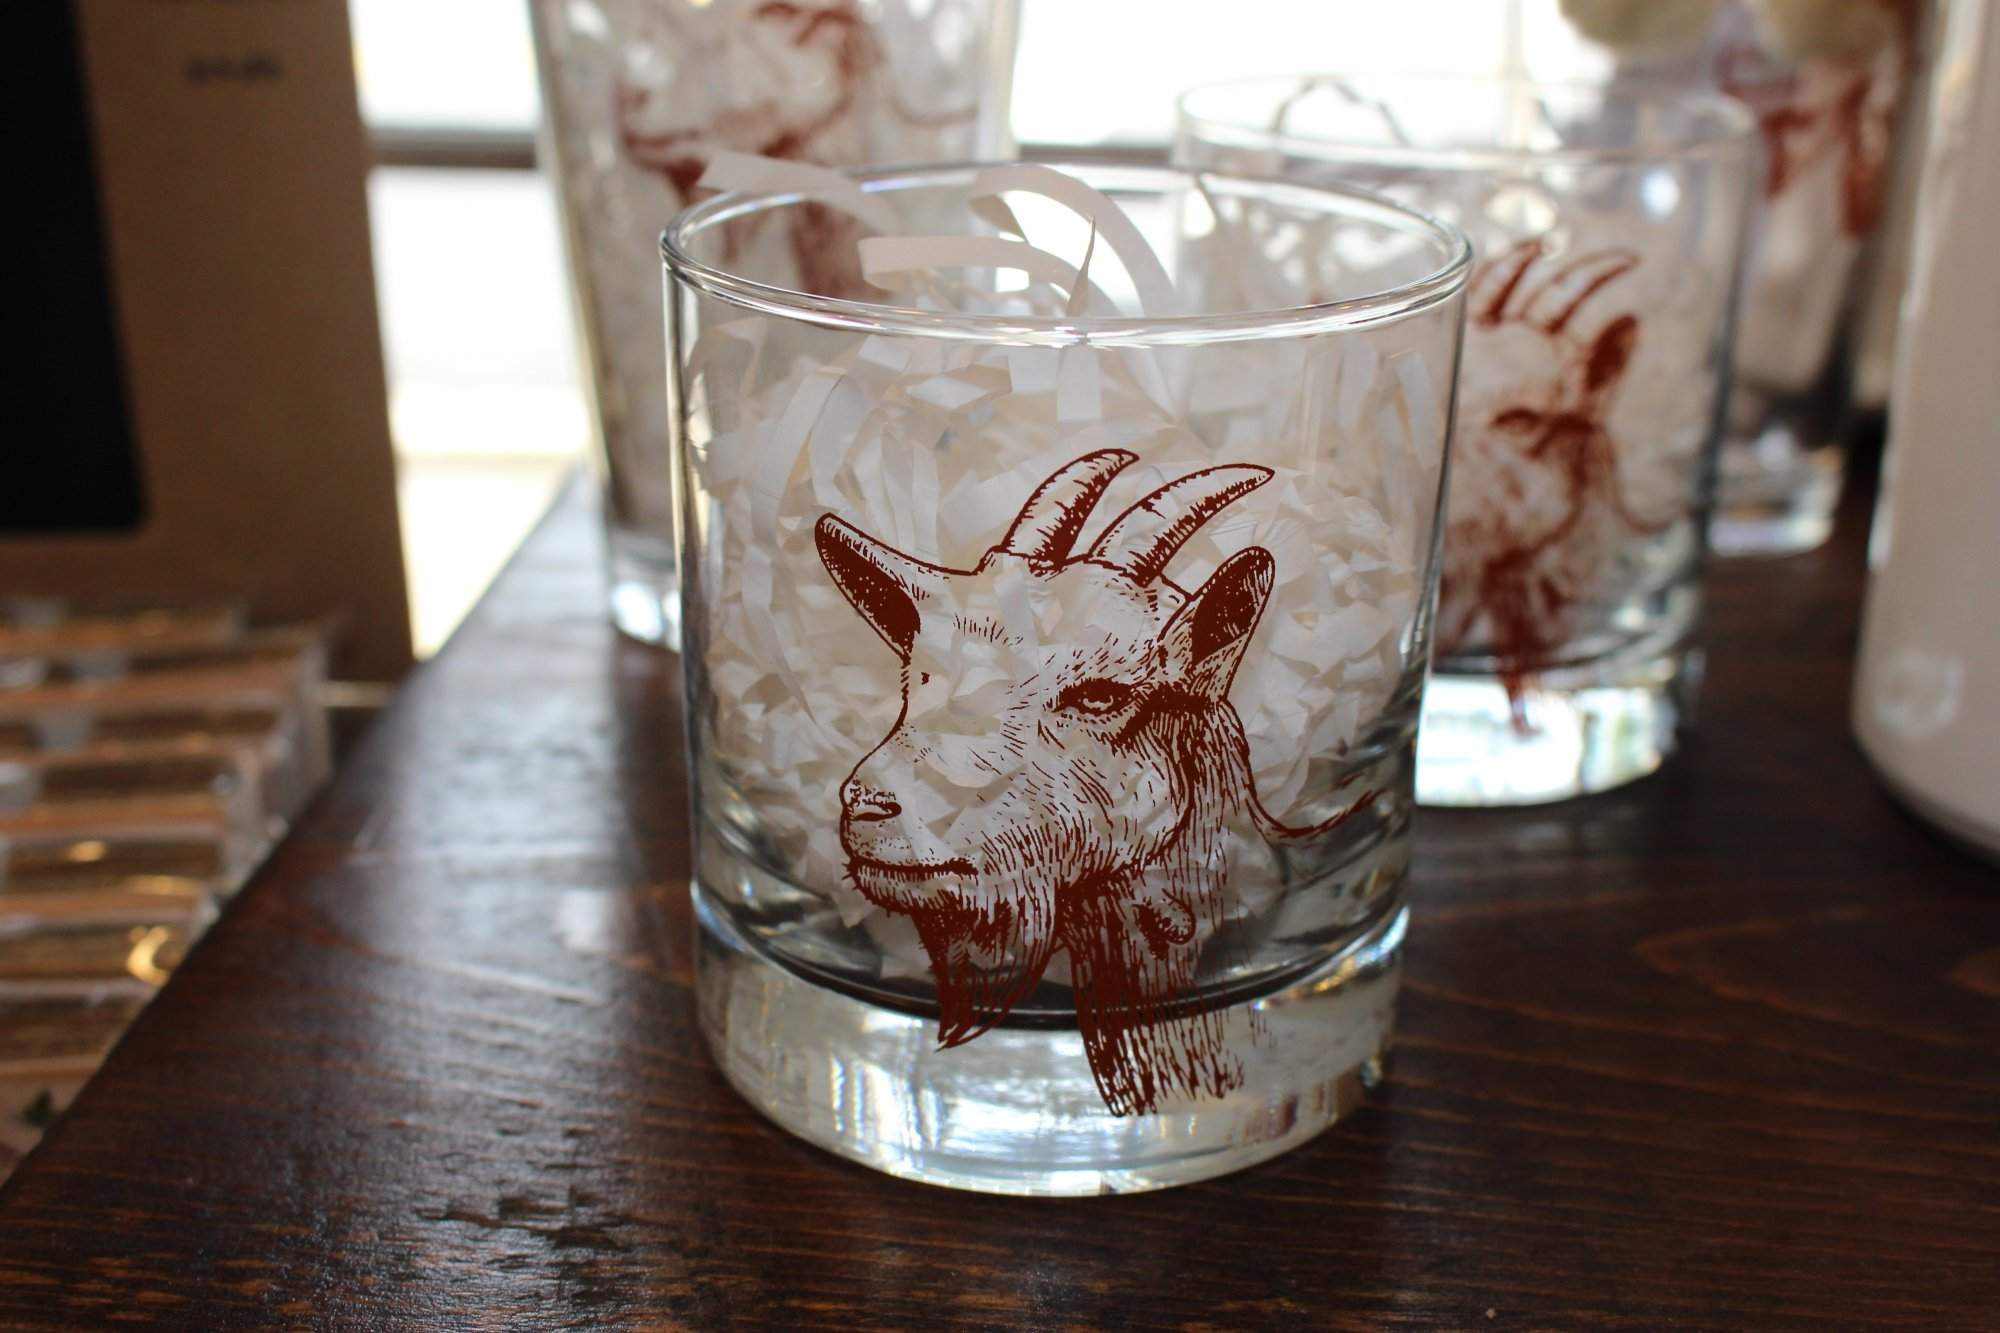 Half pint O' Goat